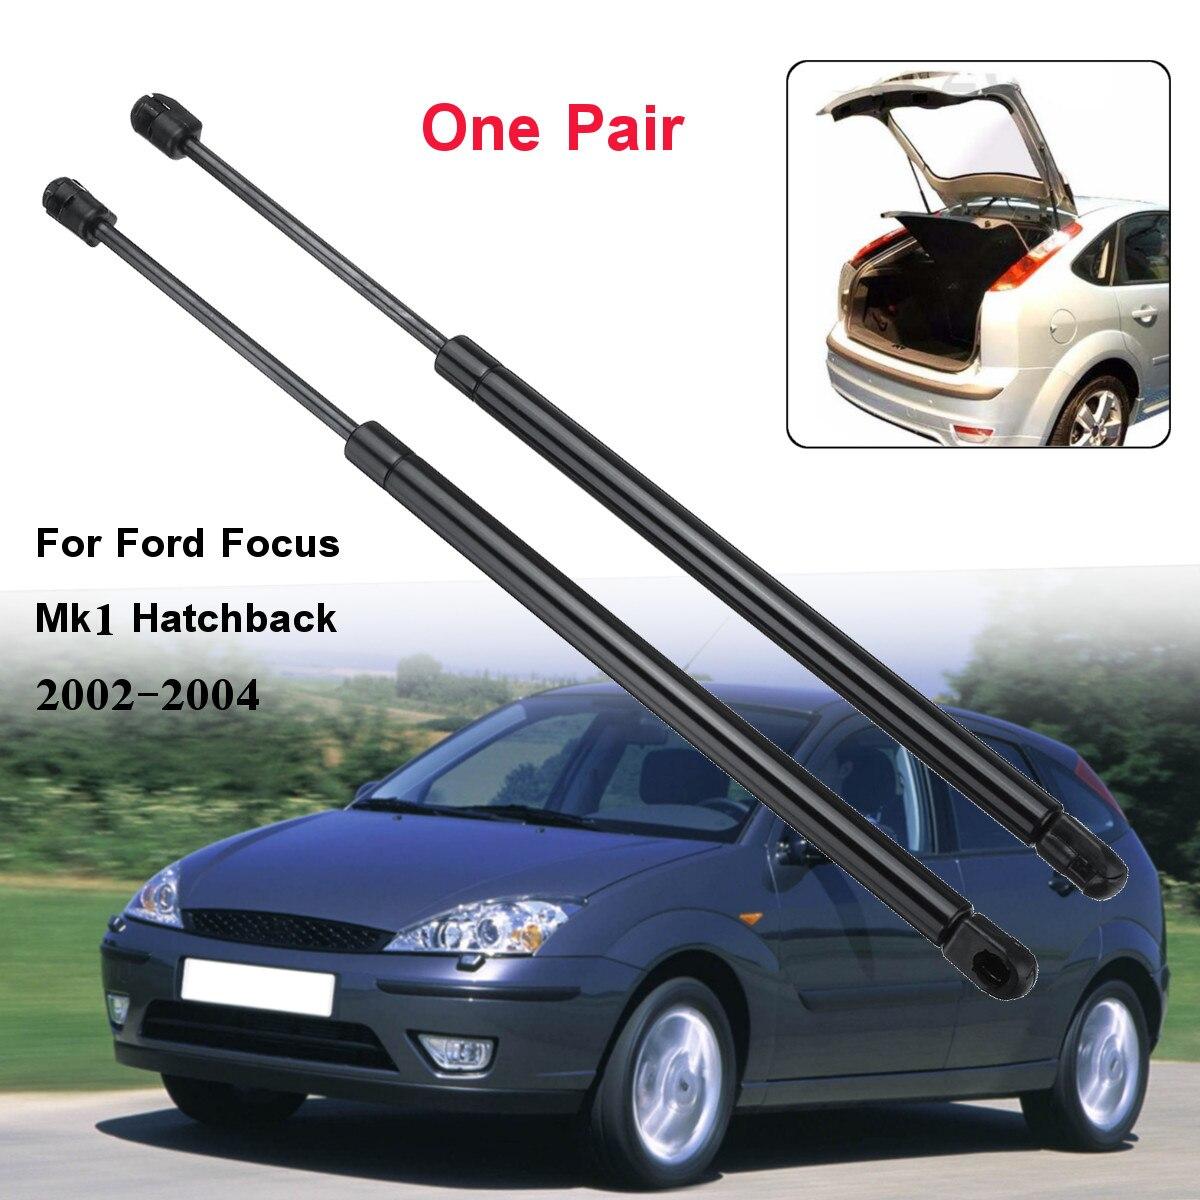 2 uds. Maletero trasero para coche, apoyo para Ford para Focus Mk1 Hatchback 1998 1999 2000 2001 2002 2003 2004